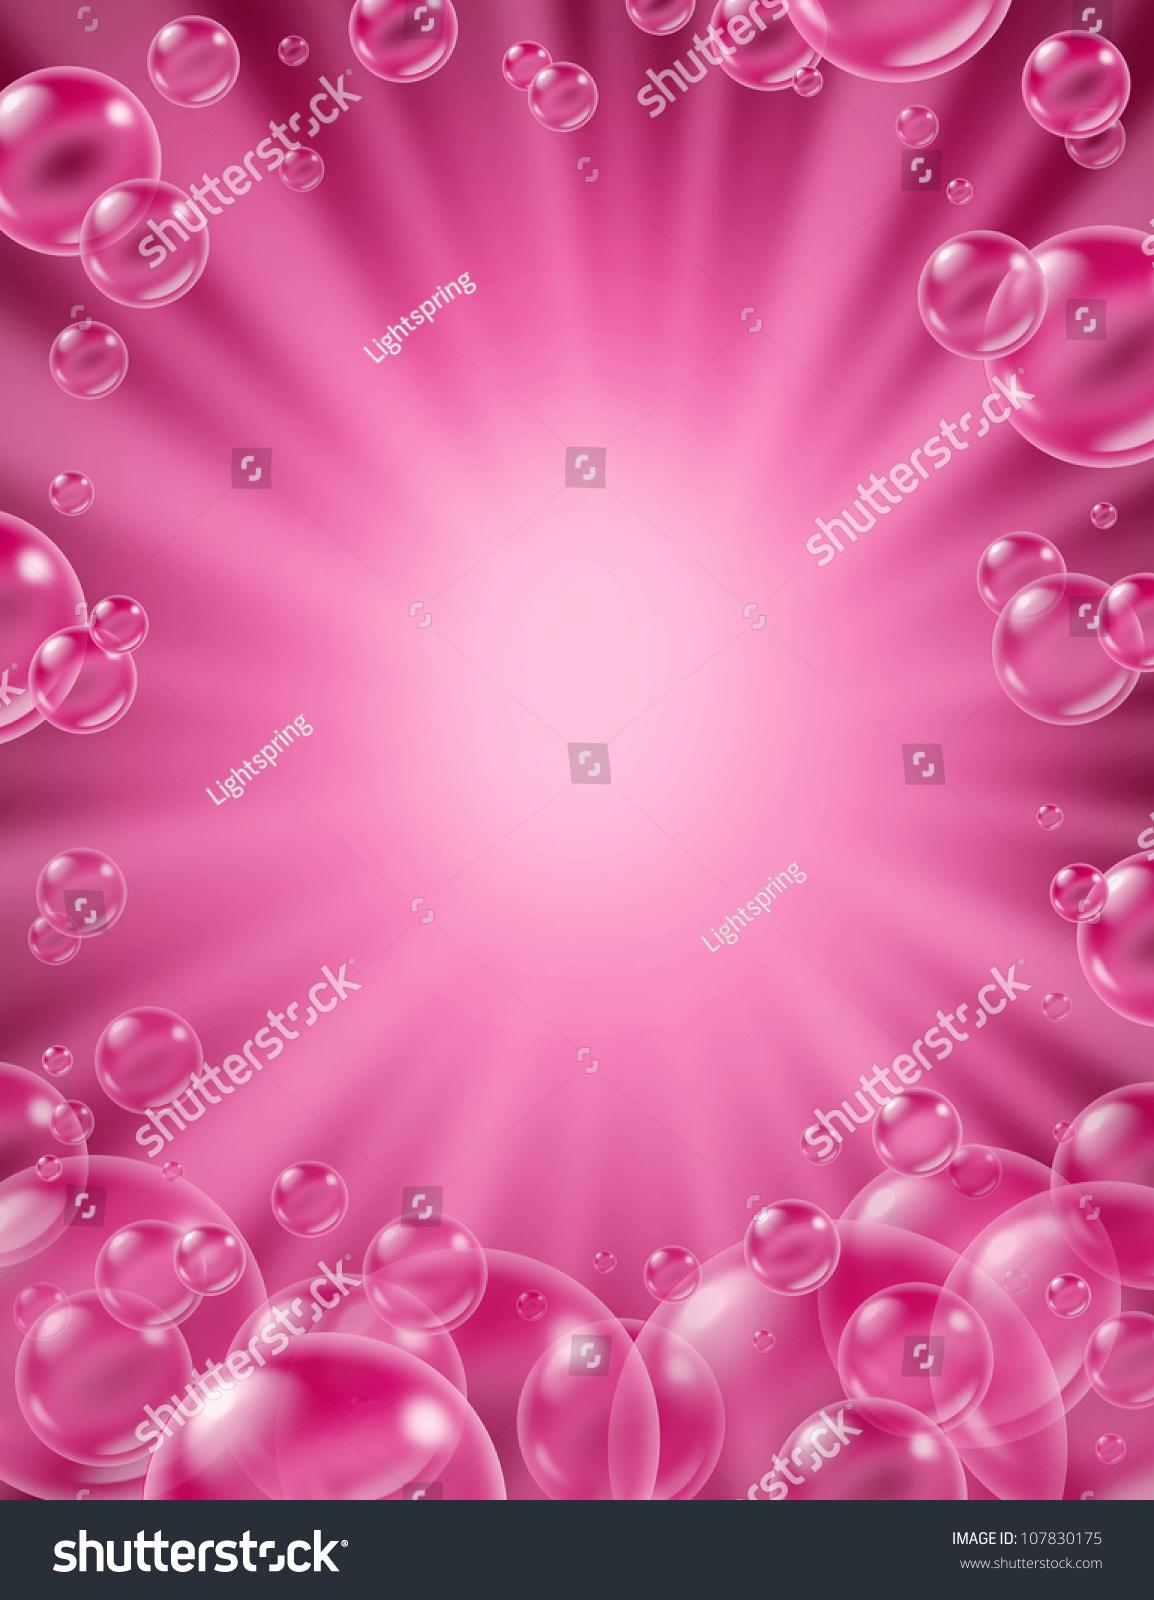 Pink Bubbles Background 68493 Interiordesign